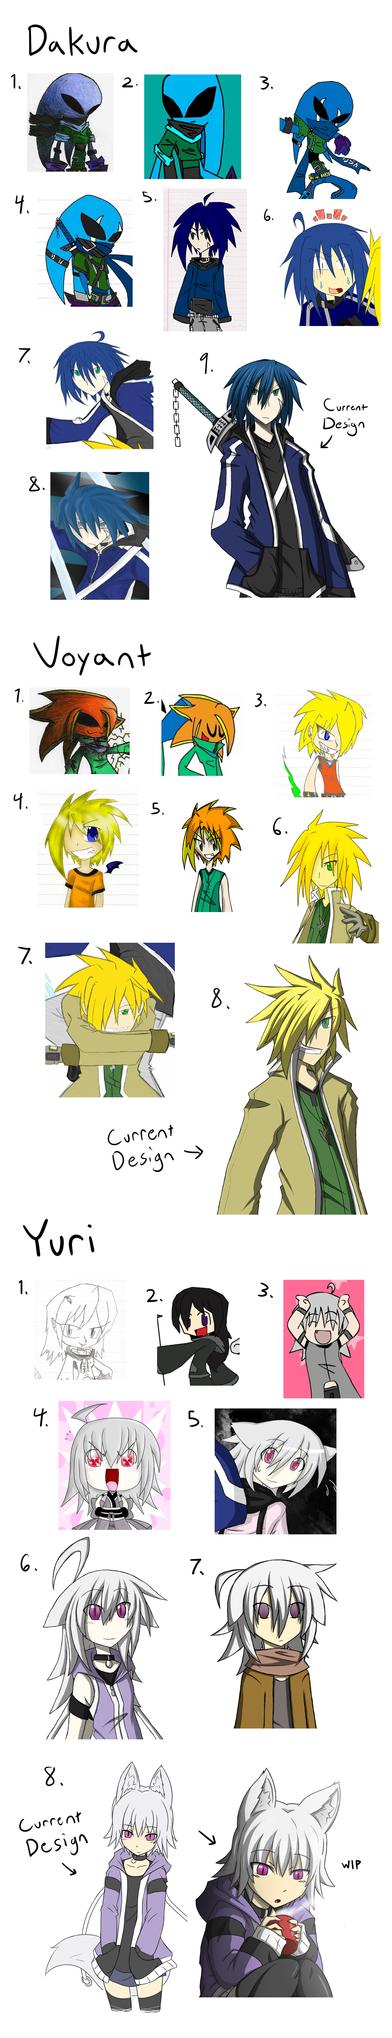 Rakkushi - Evolution Of My Characters by RakkuGuy